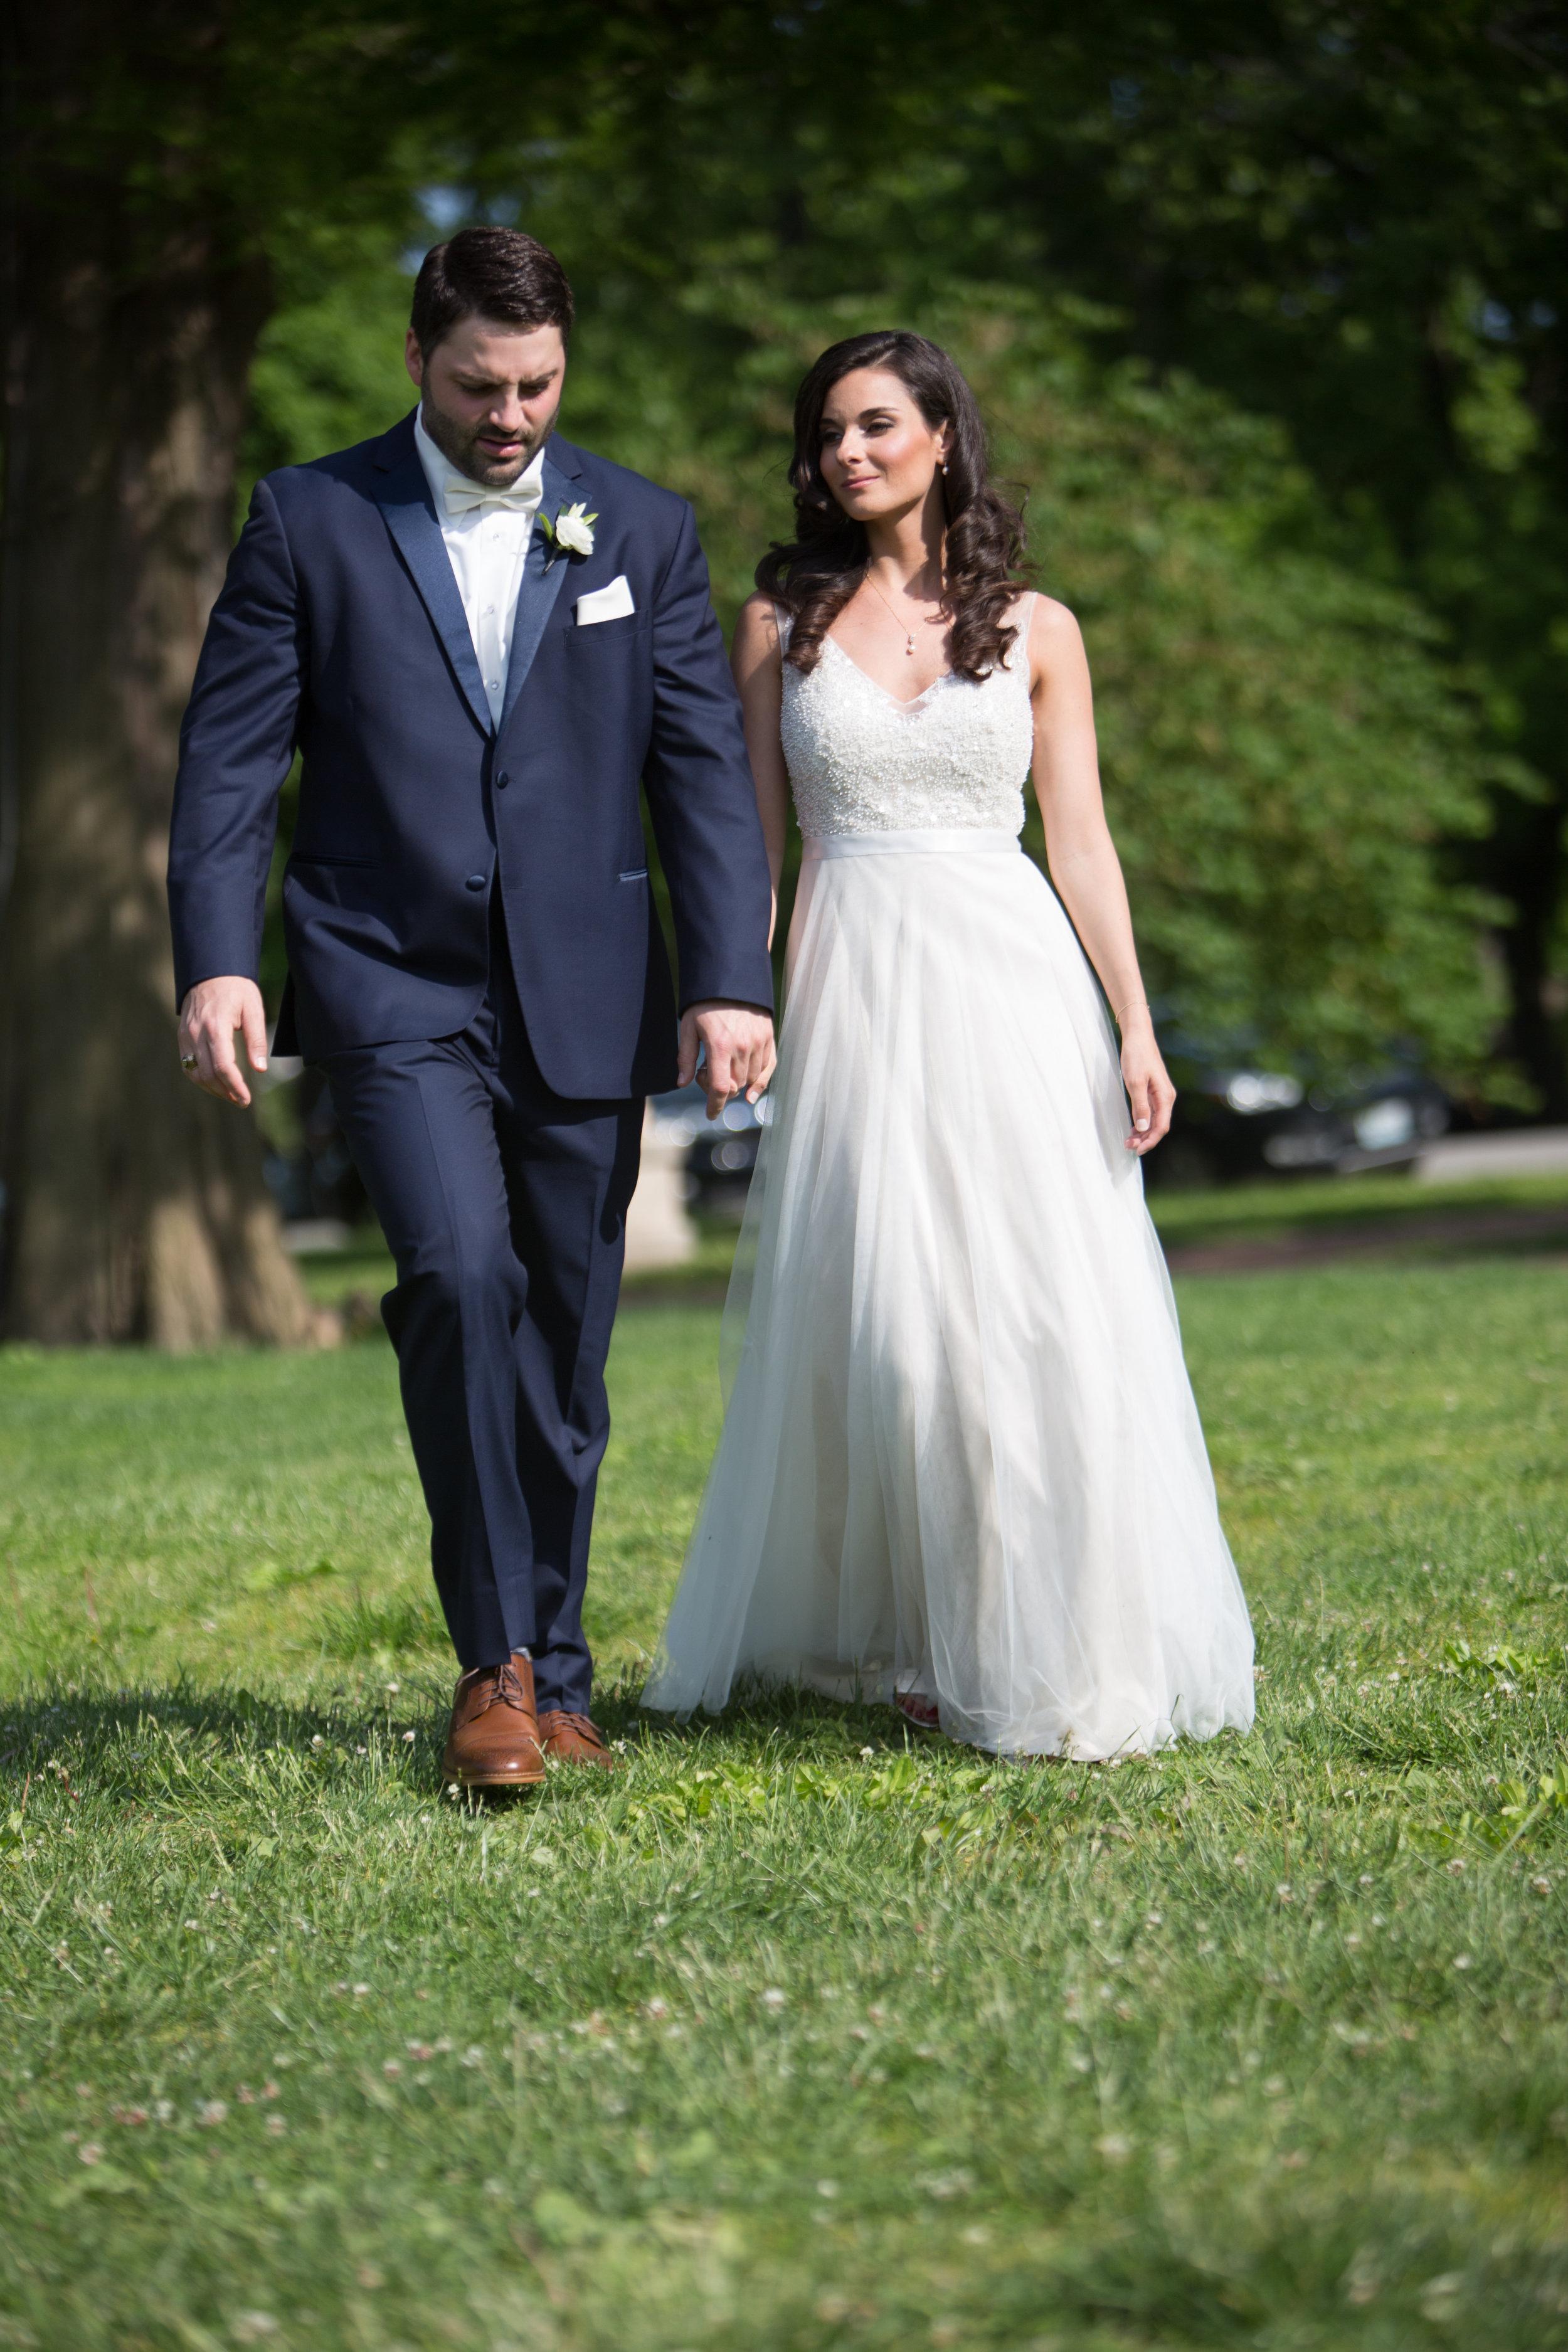 St. Louis Photographer St. Charles Photographer Engagement Wedding Photographer (45).jpg